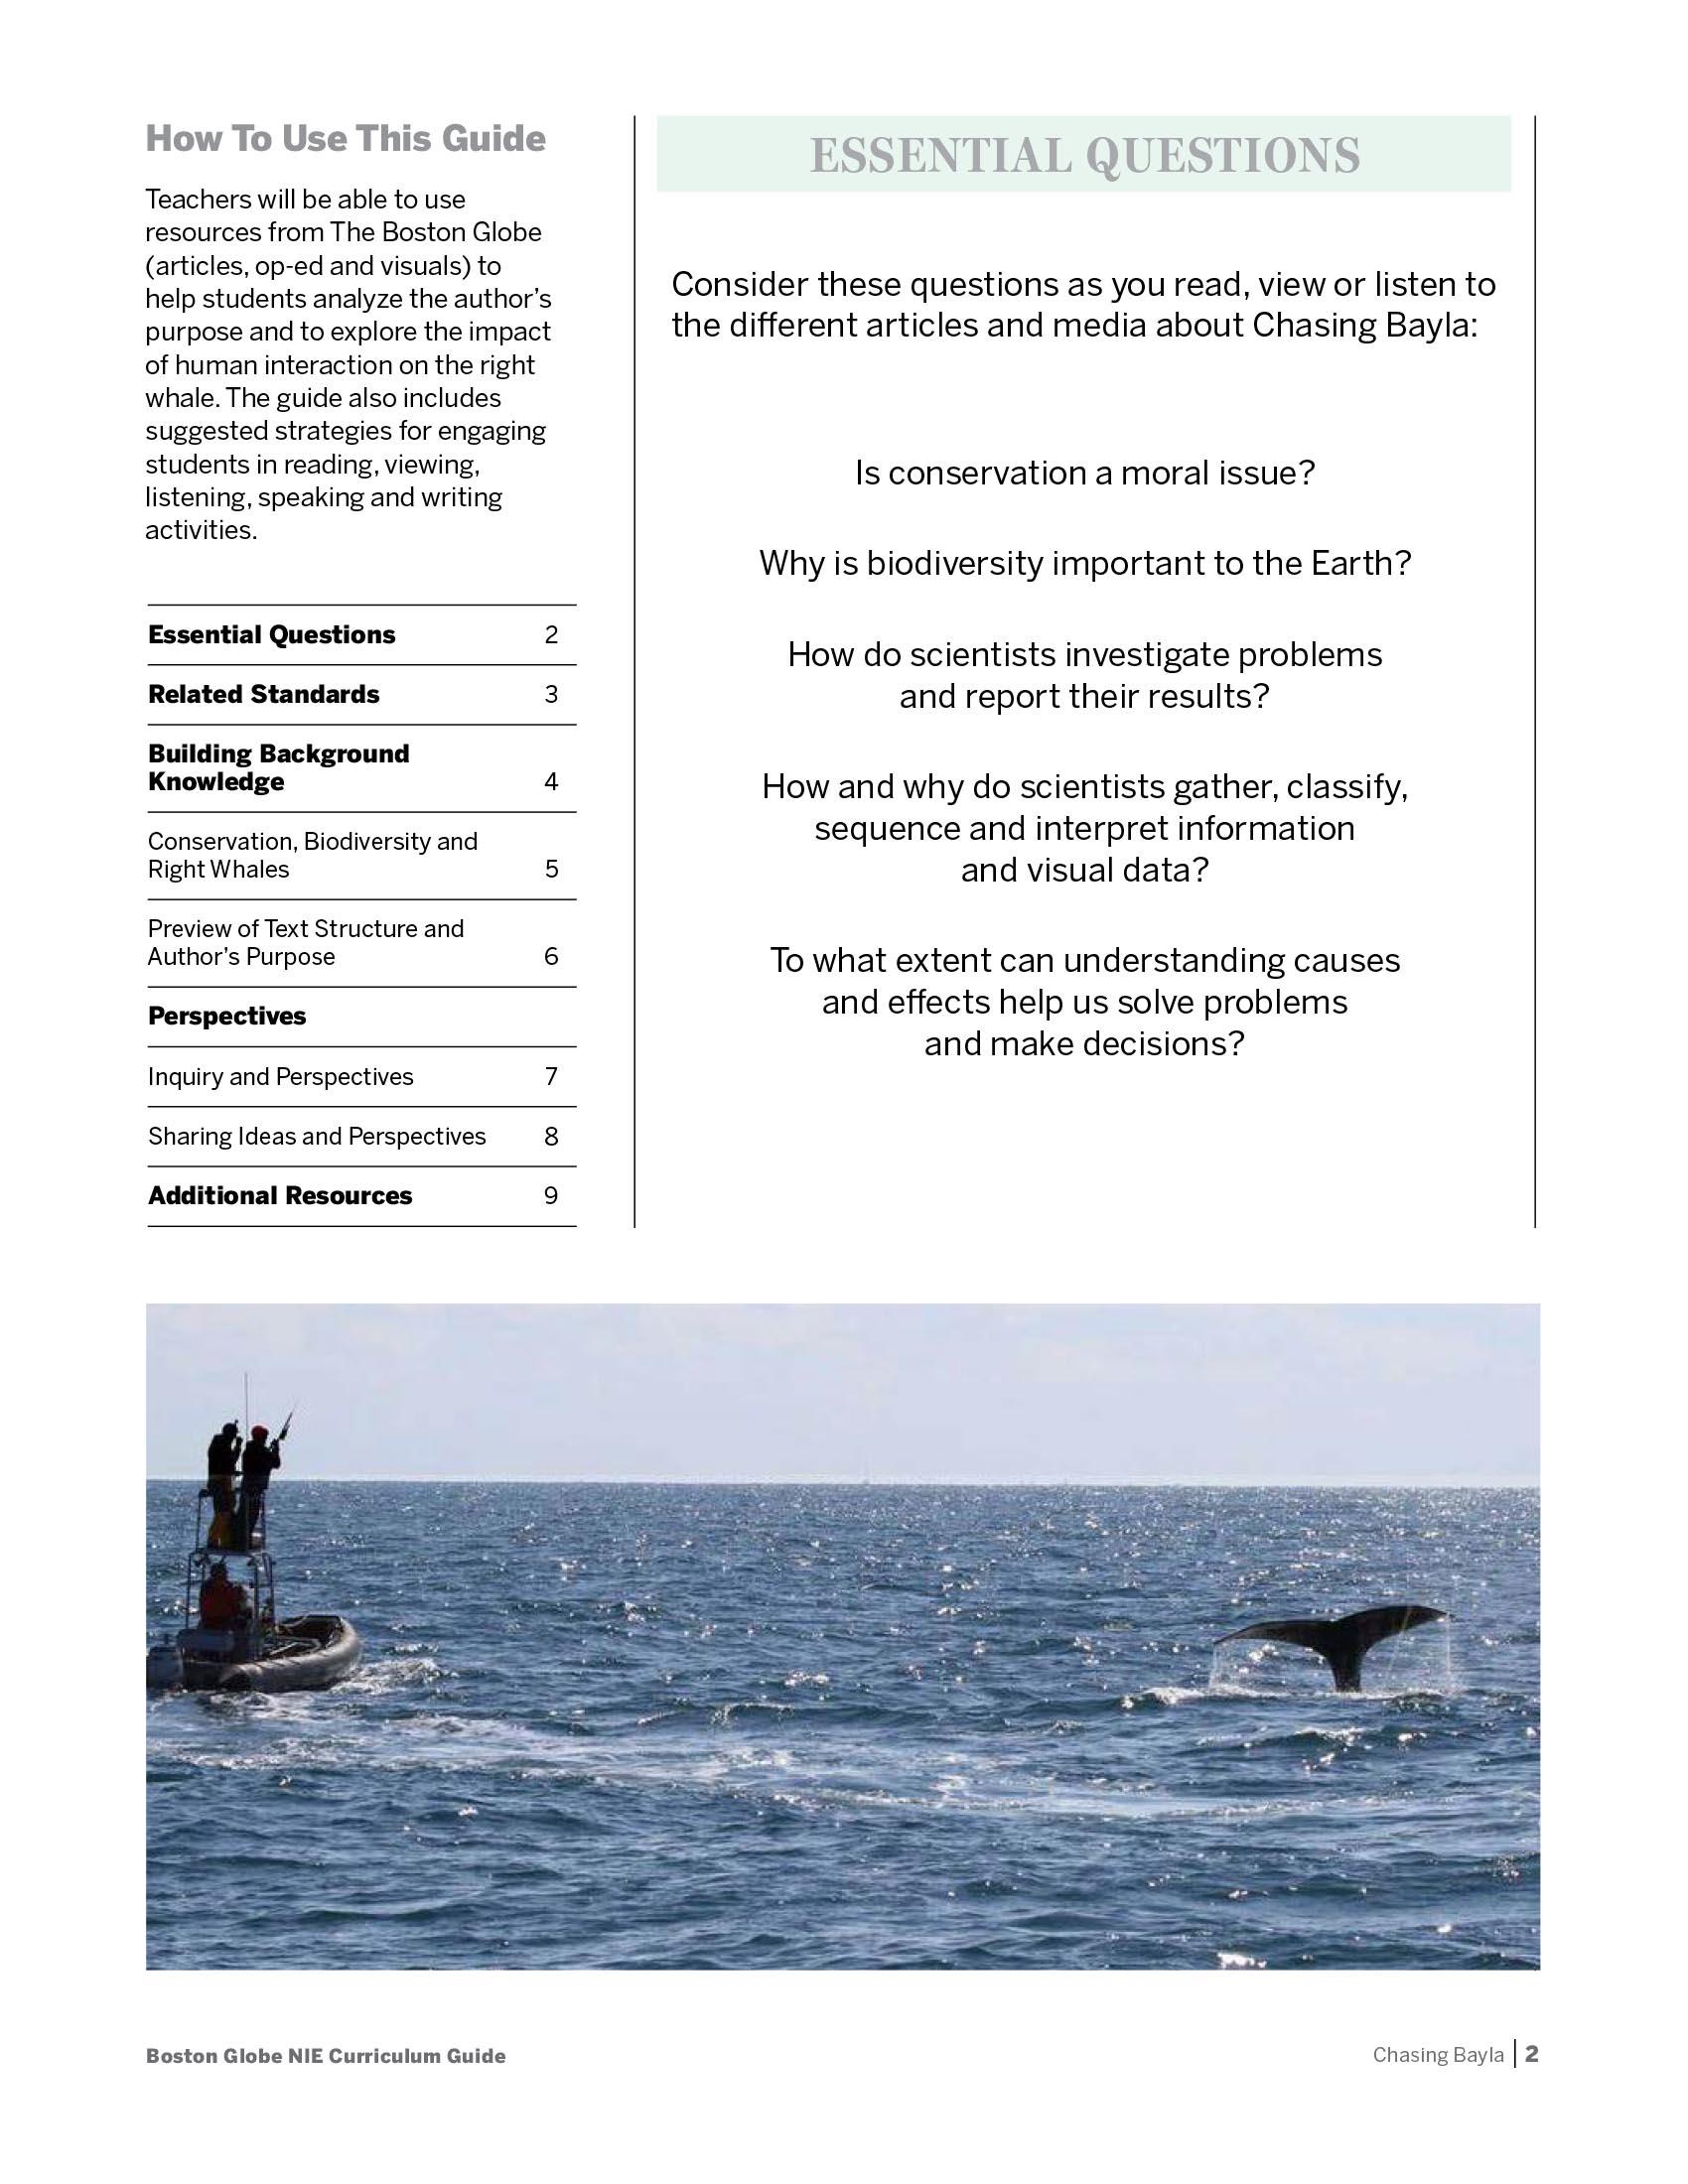 Boston Globe News in Education curriculum guide